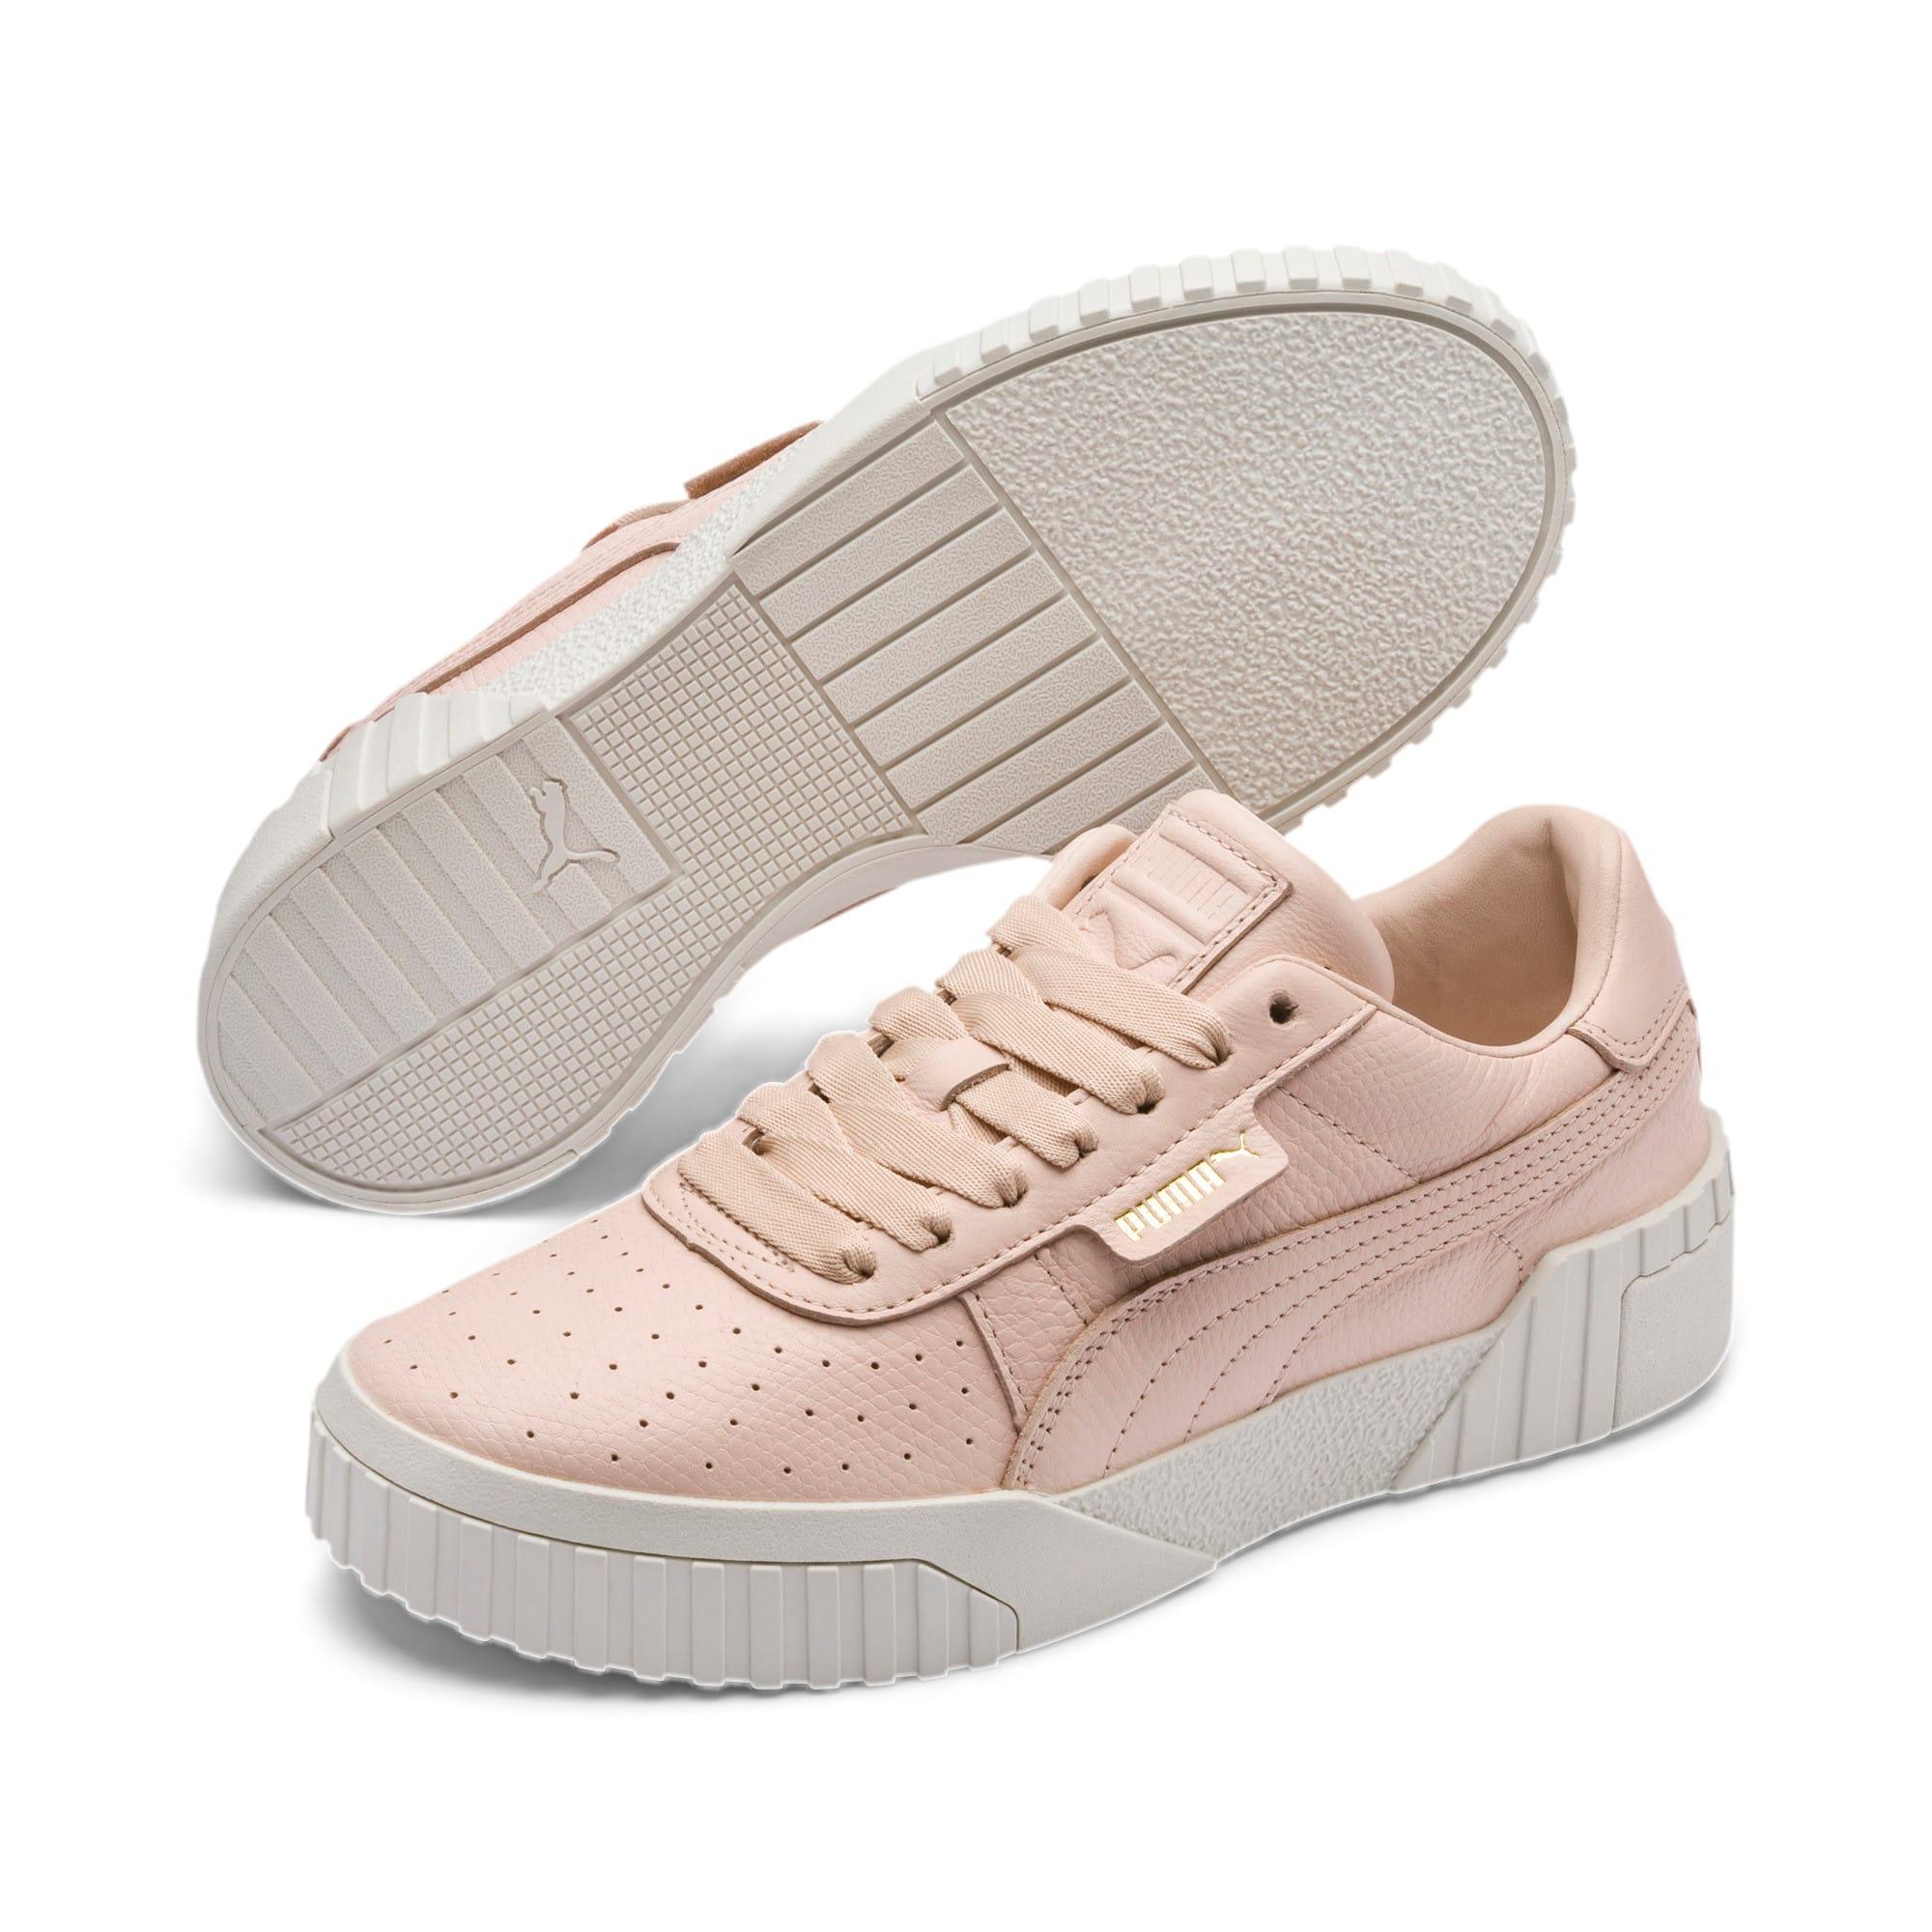 Thumbnail 3 of Cali Emboss Women's Sneakers, Cream Tan-Cream Tan, medium